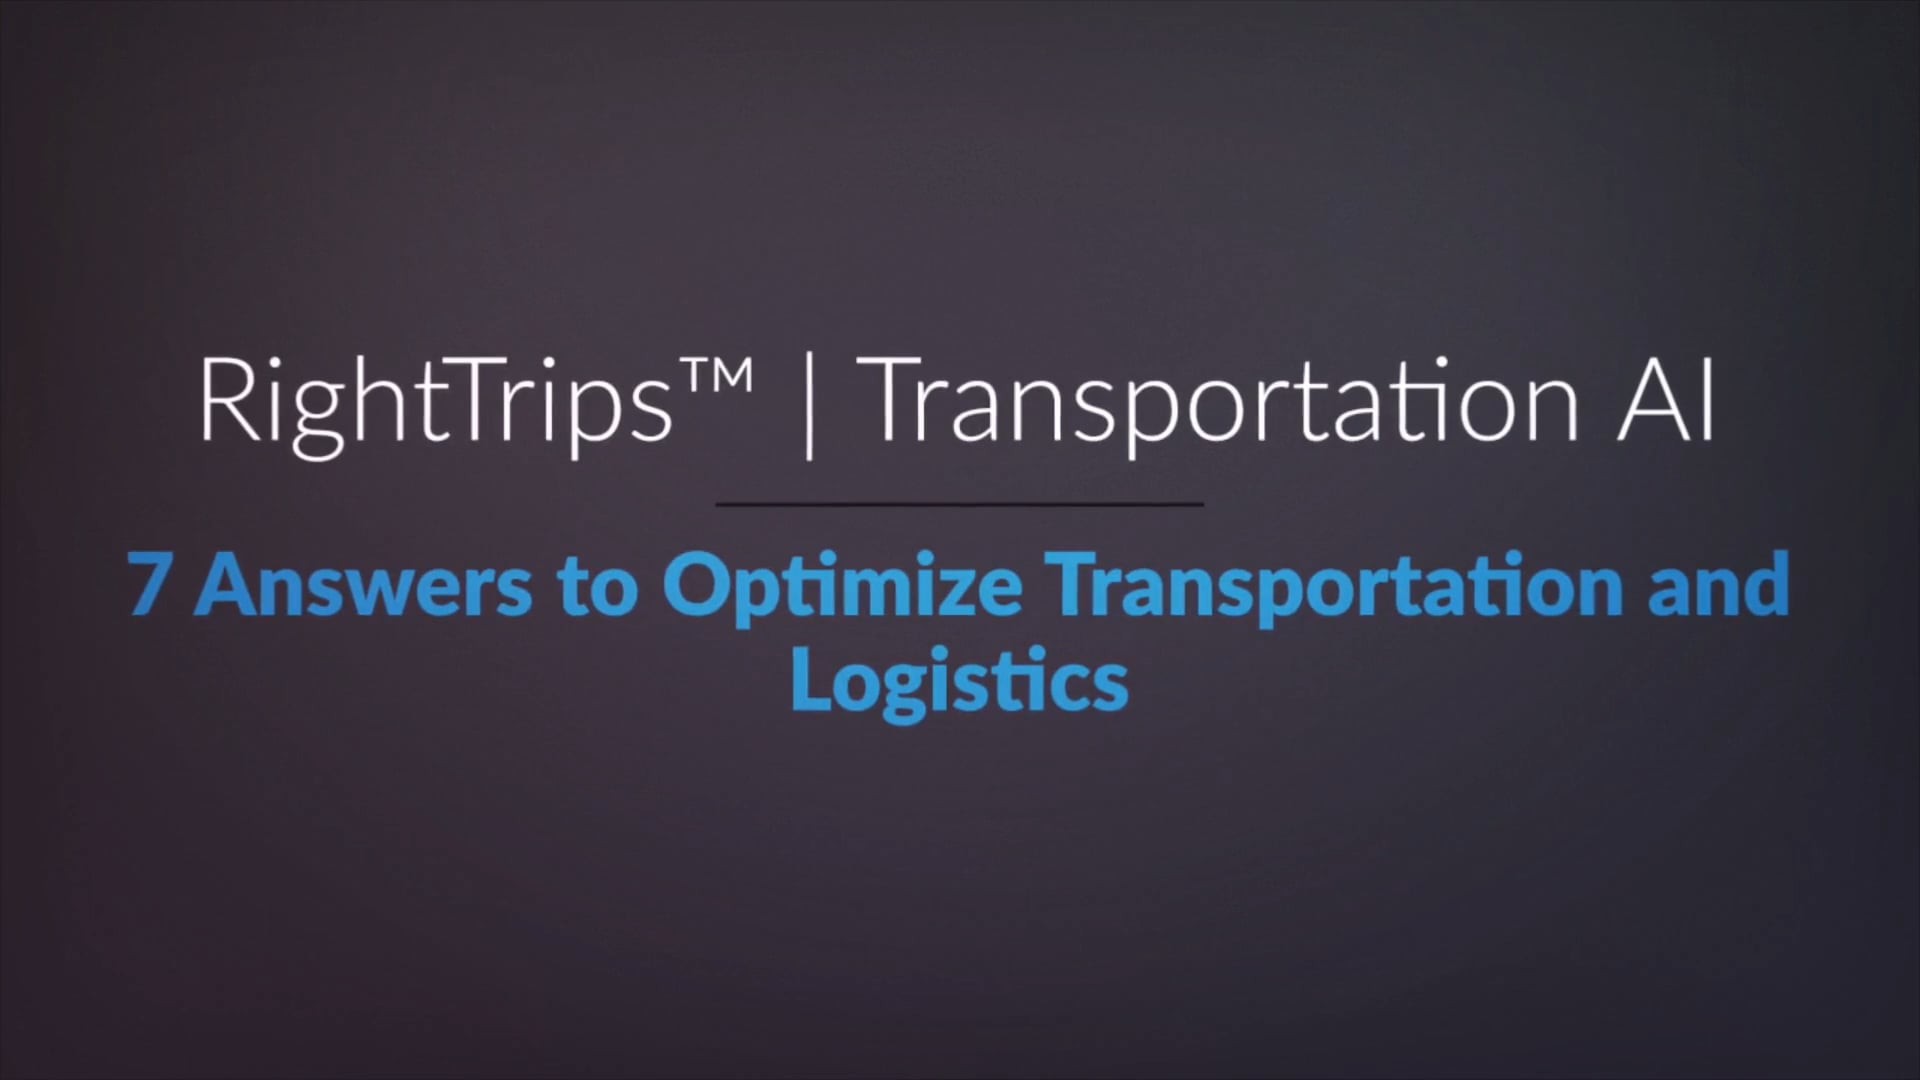 RightTrips | Transportation AI